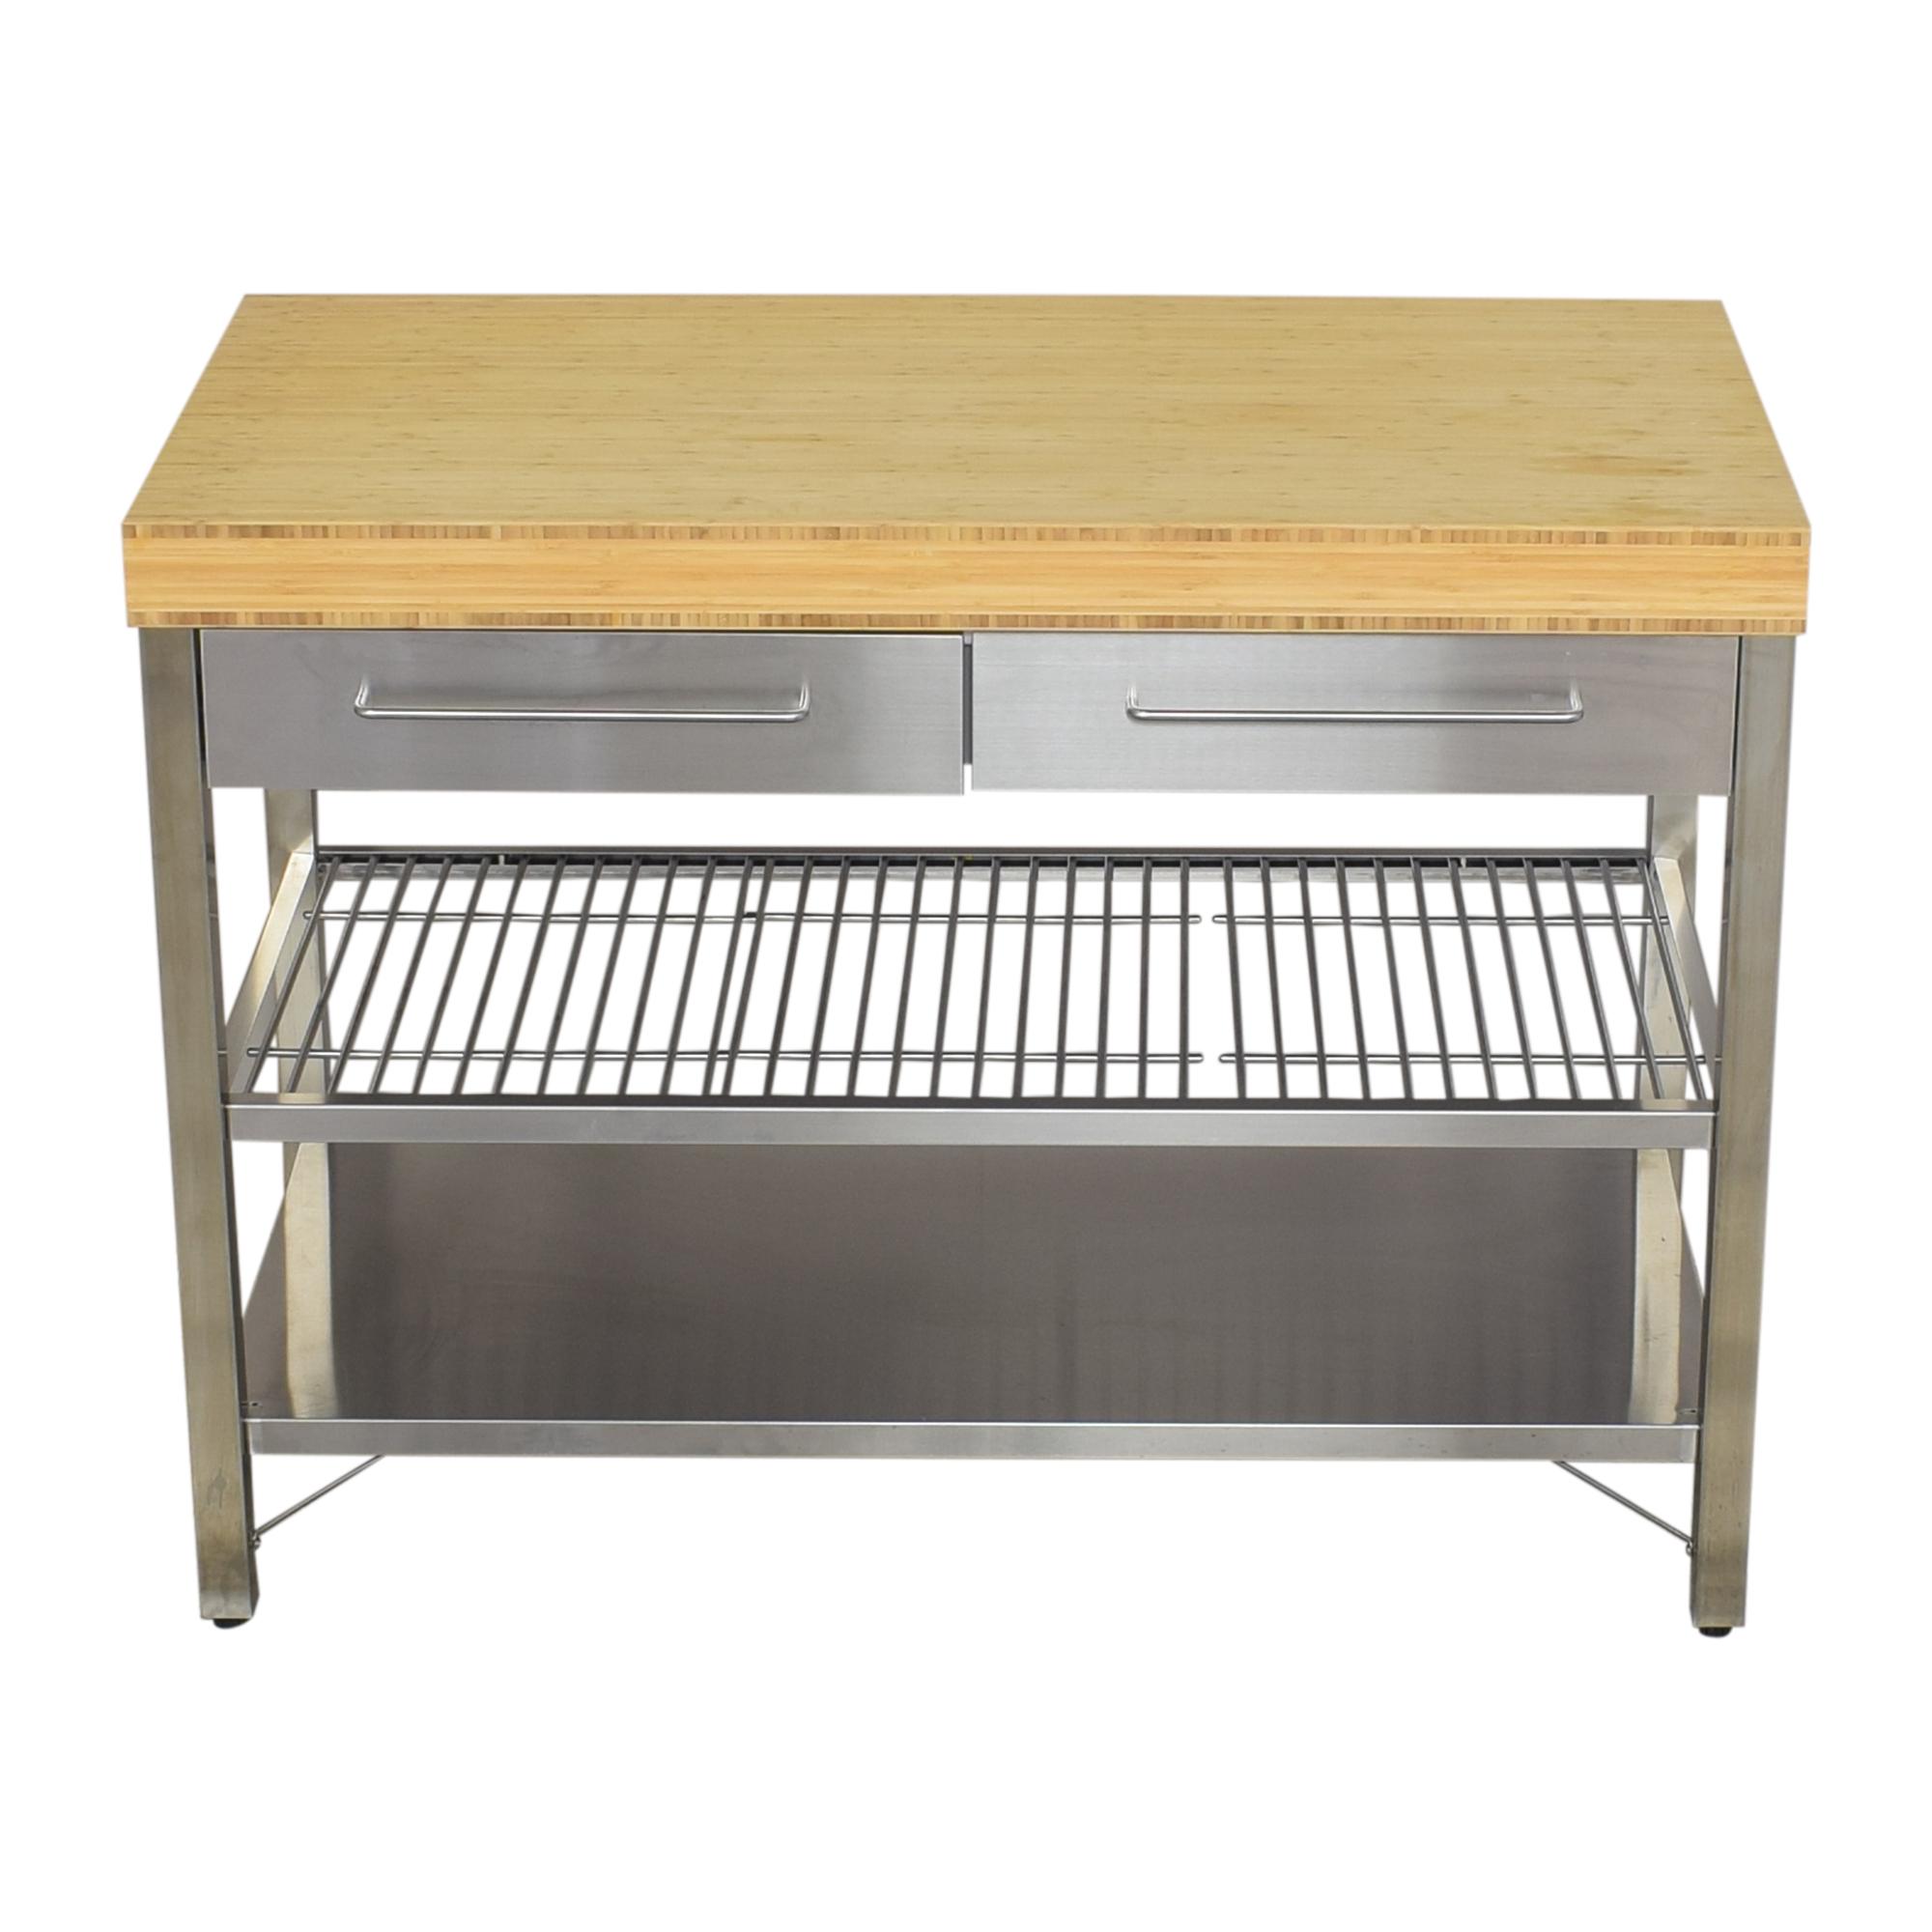 shop IKEA RIMFORSA Work Bench IKEA Utility Tables